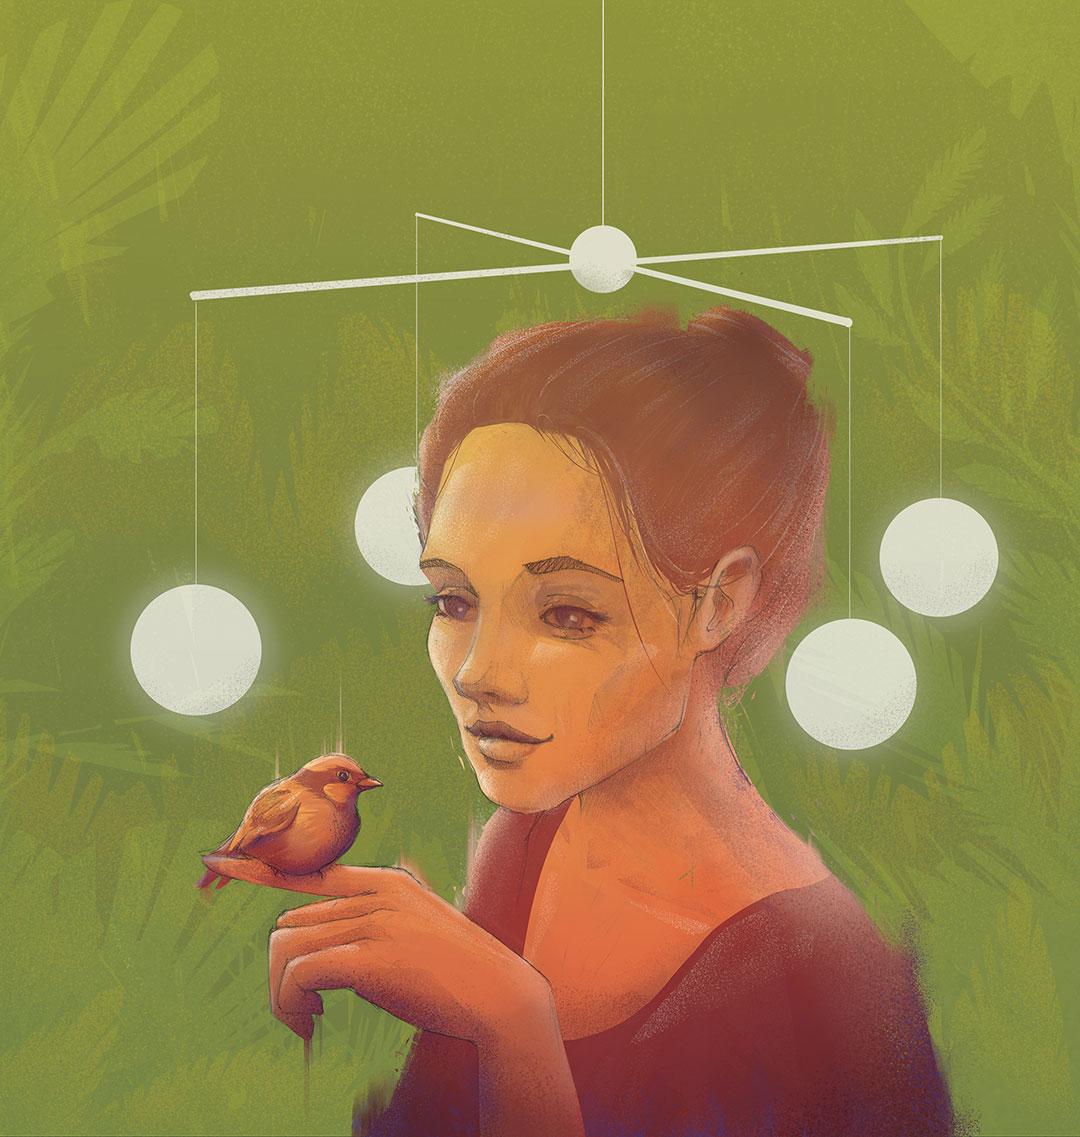 Illustration about mindfulness for Miesięcznik Znak by Jakub Cichecki